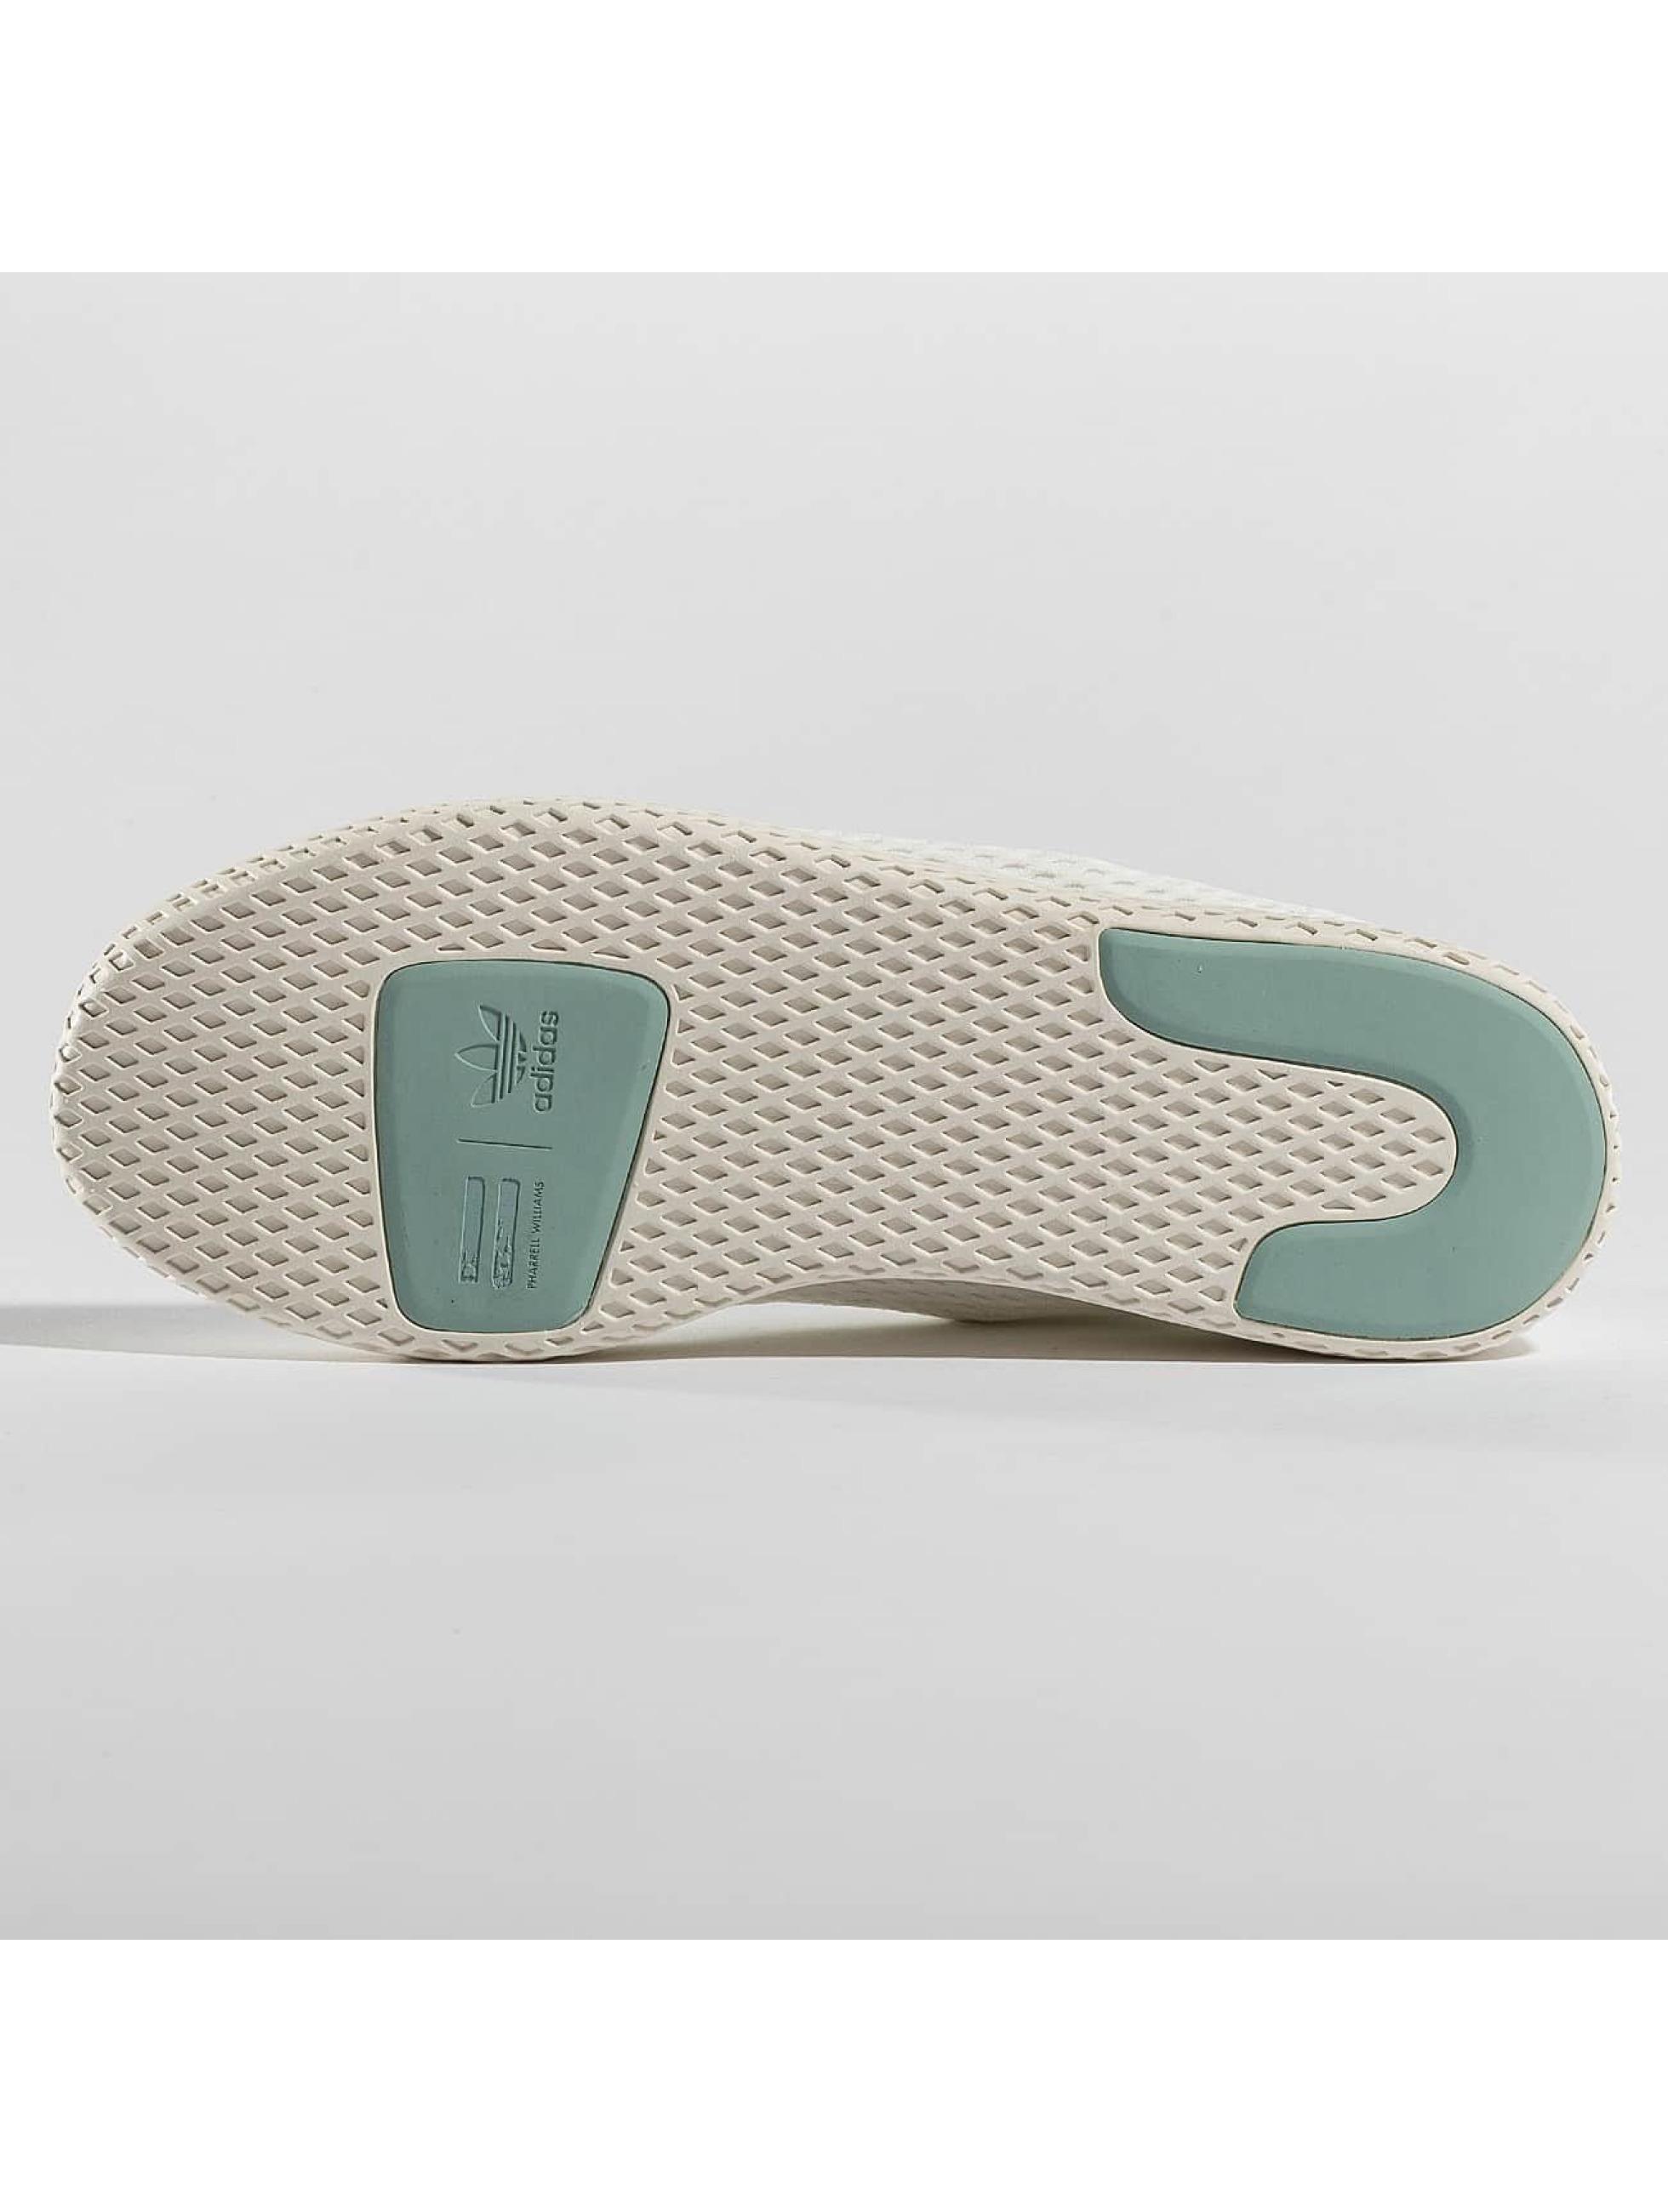 adidas Sneakers PW Tennis HU white